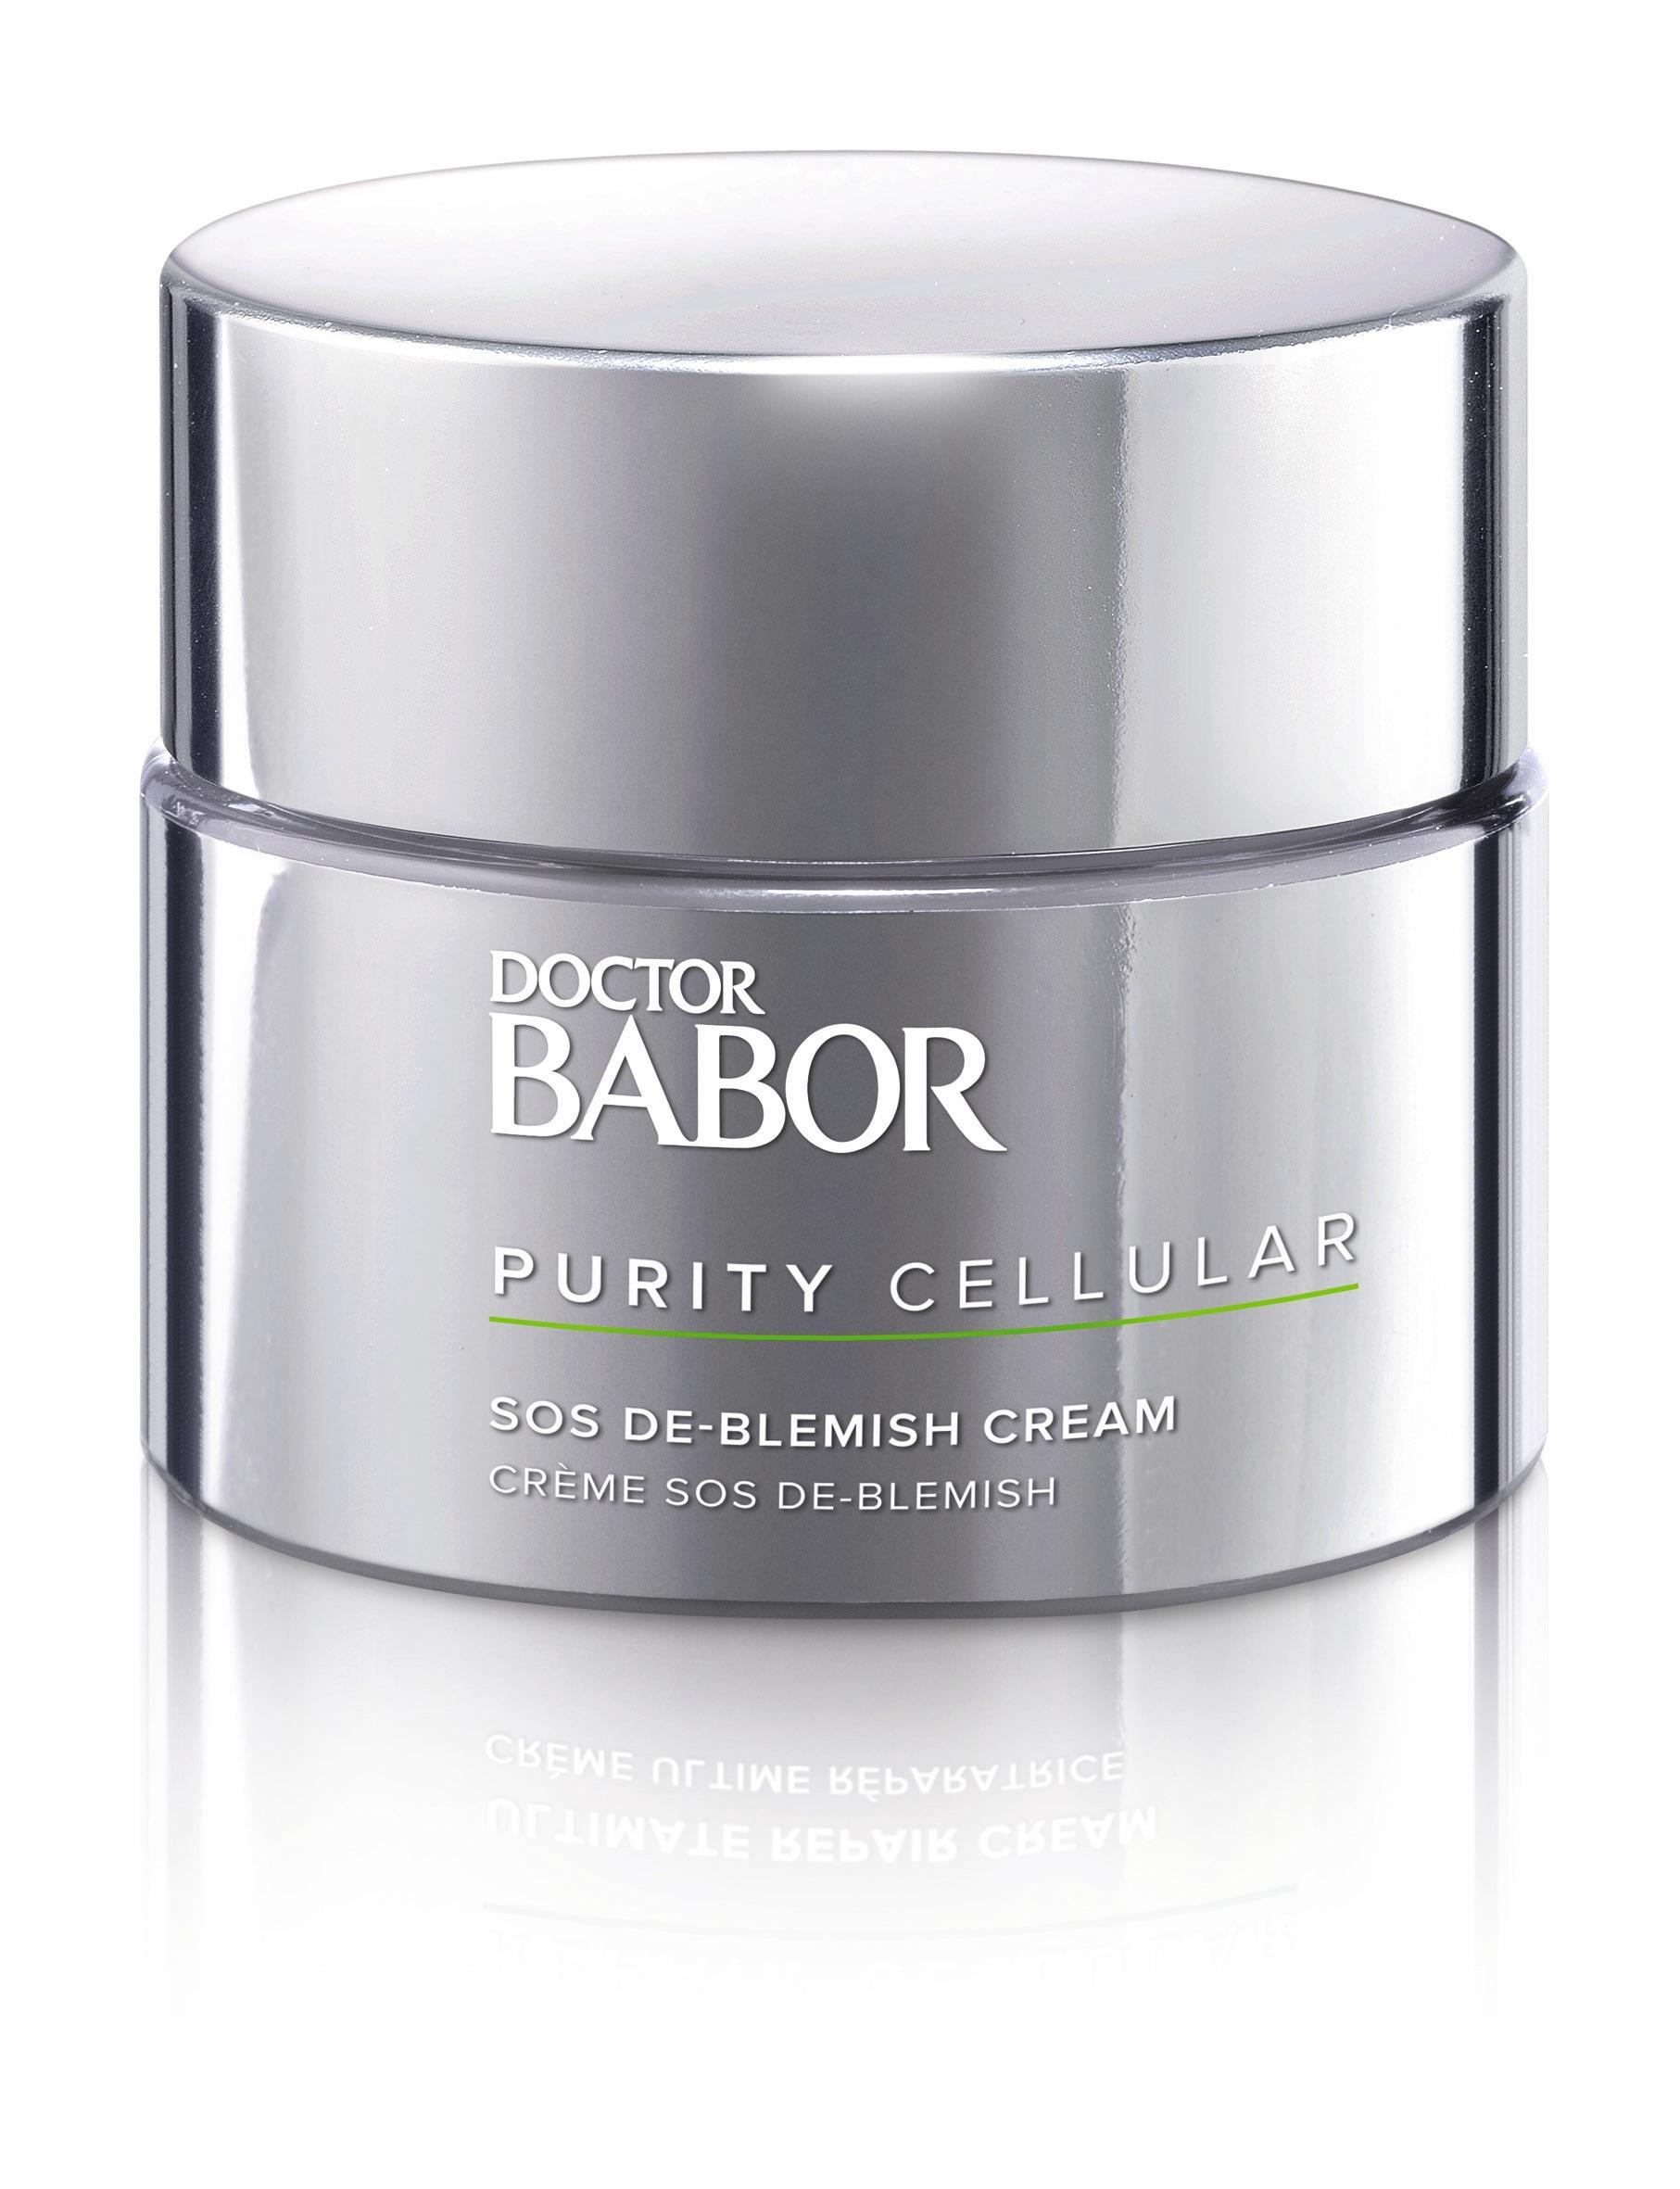 doctor-babor-purity-cellular-sos-de-blemish_cream